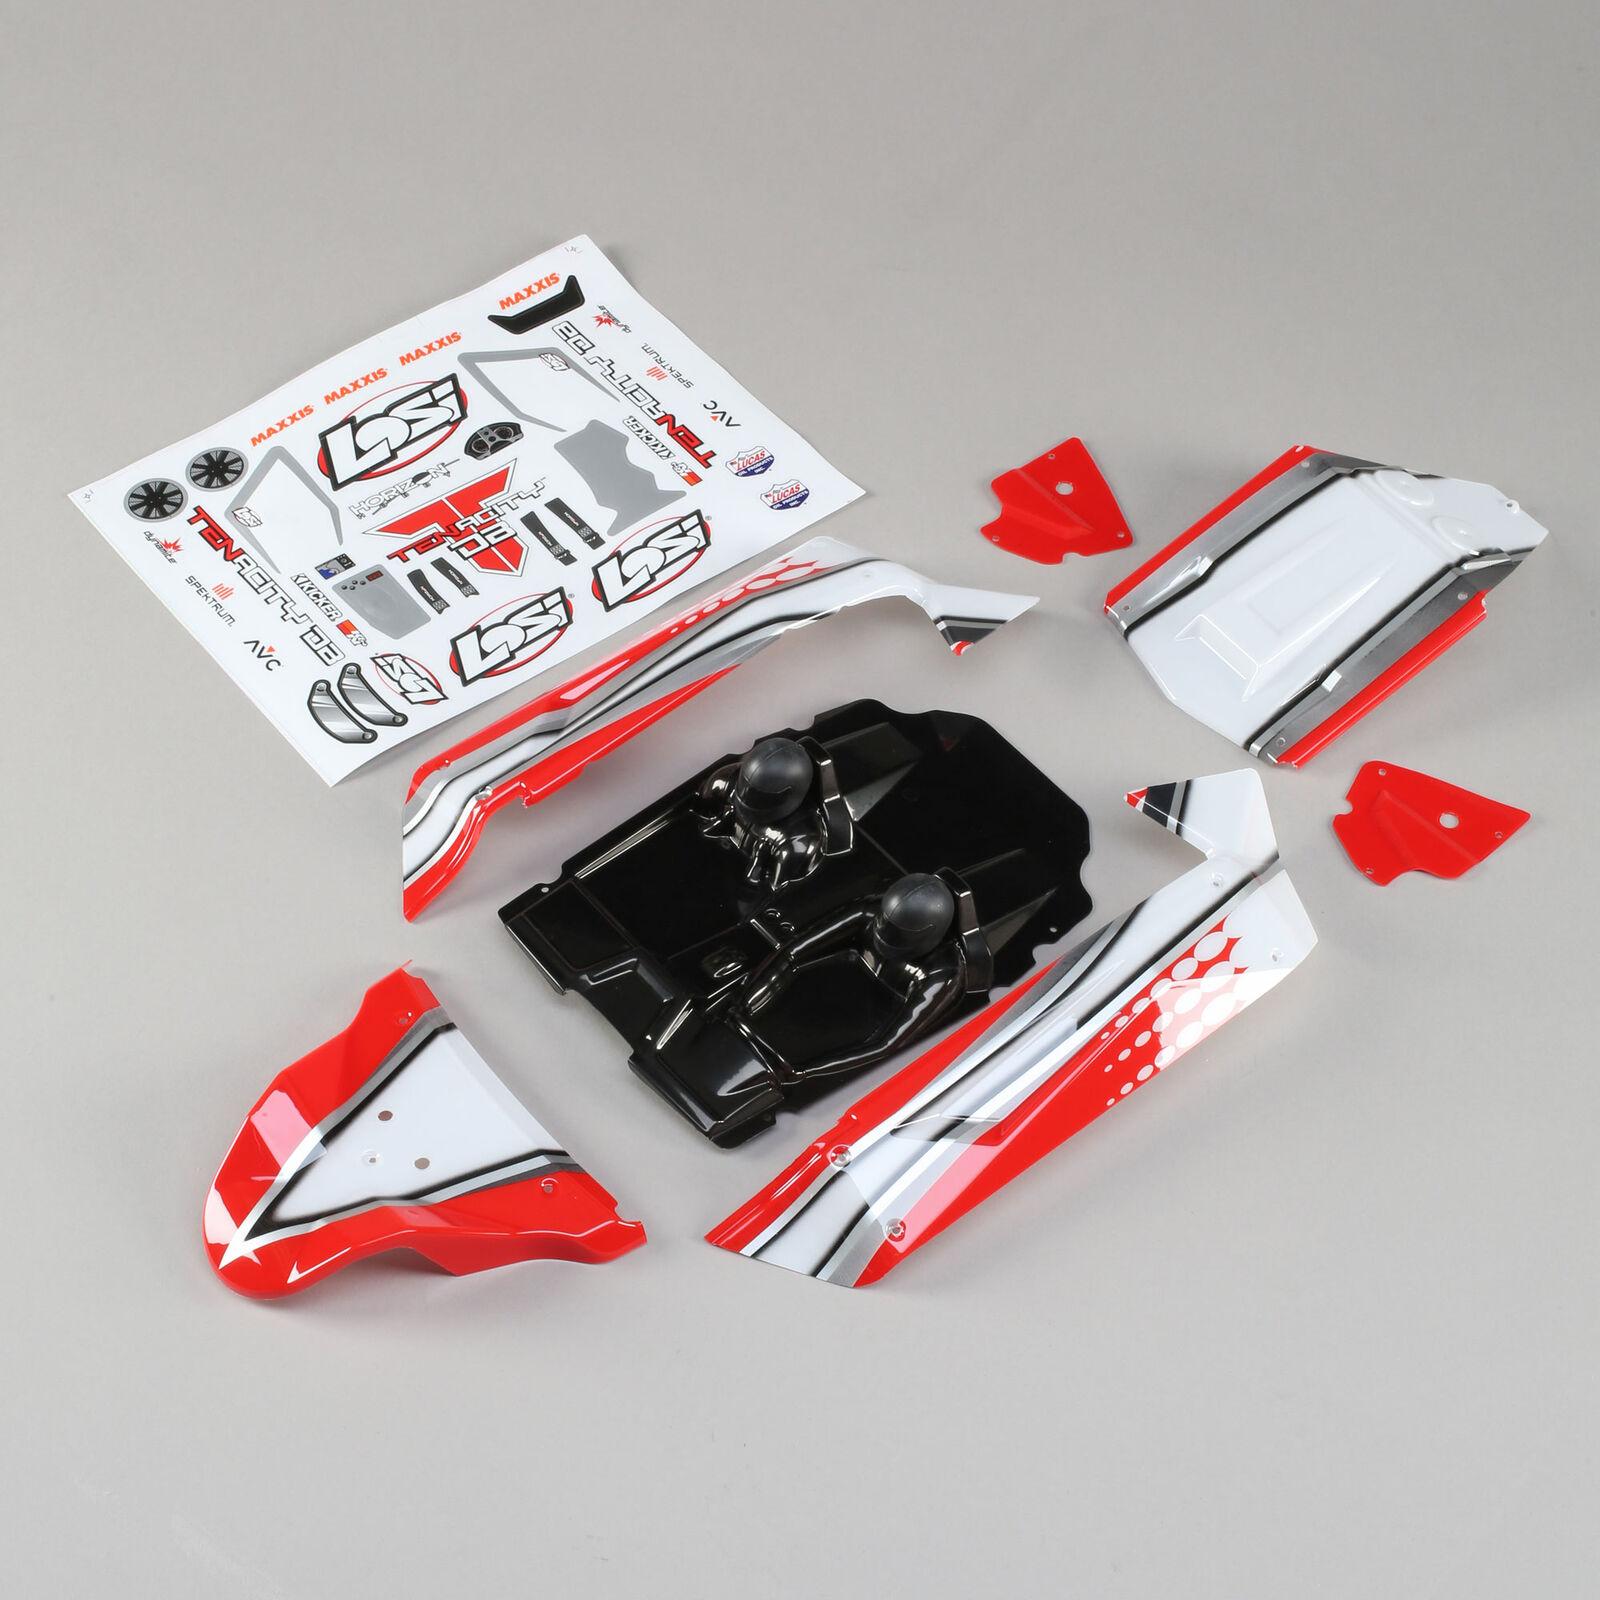 1/10 Painted Body Set, Red: Tenacity DB